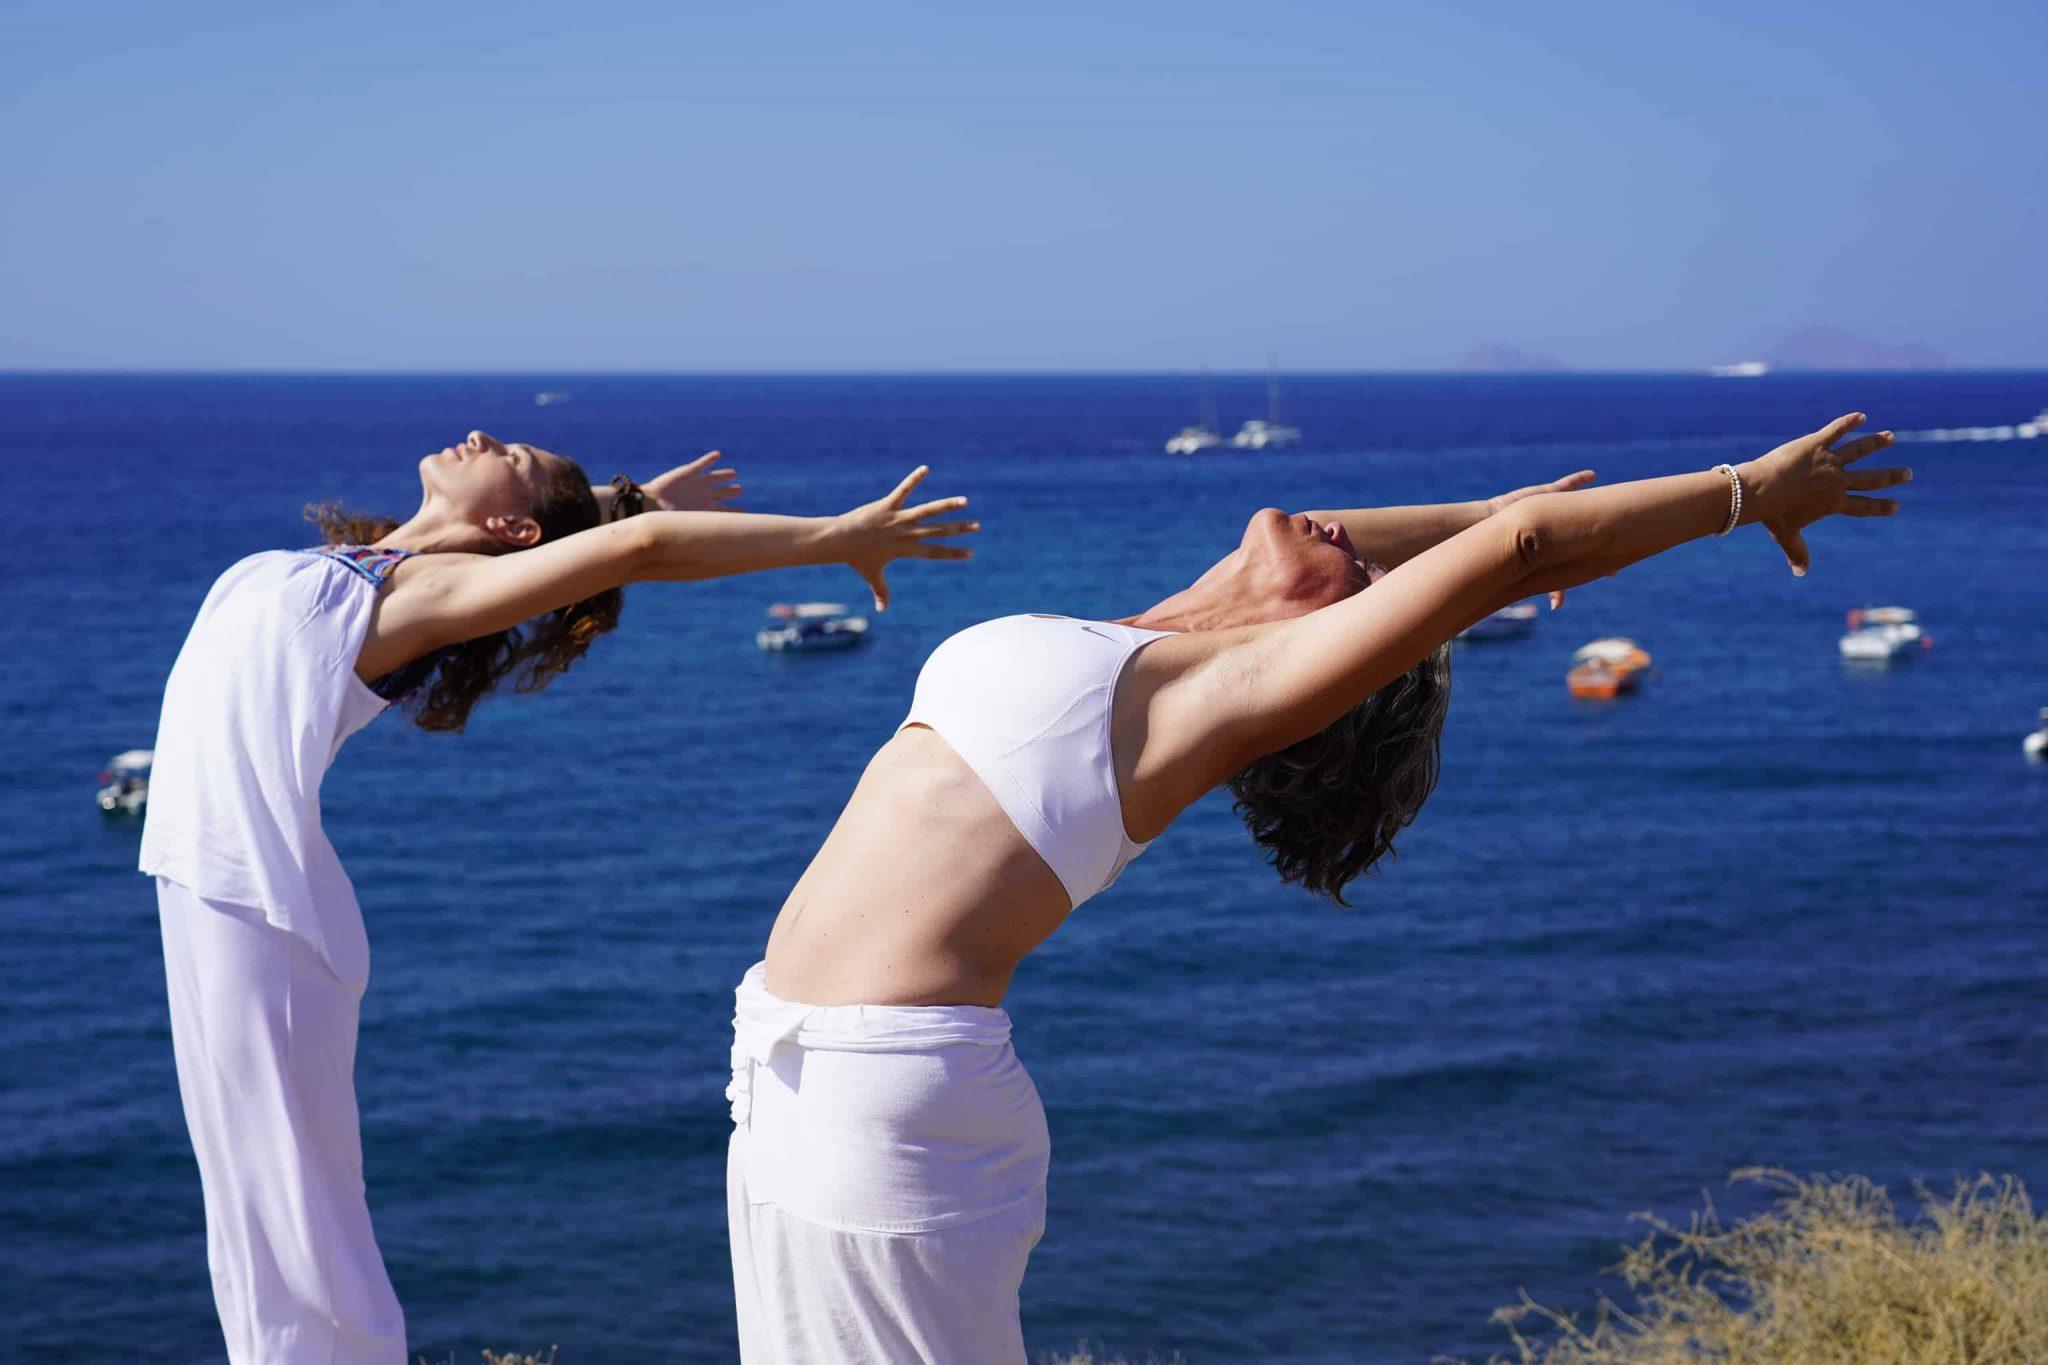 DSC00767 - 7 days Yoga in Santorin Greece - A YogaYamas vacation